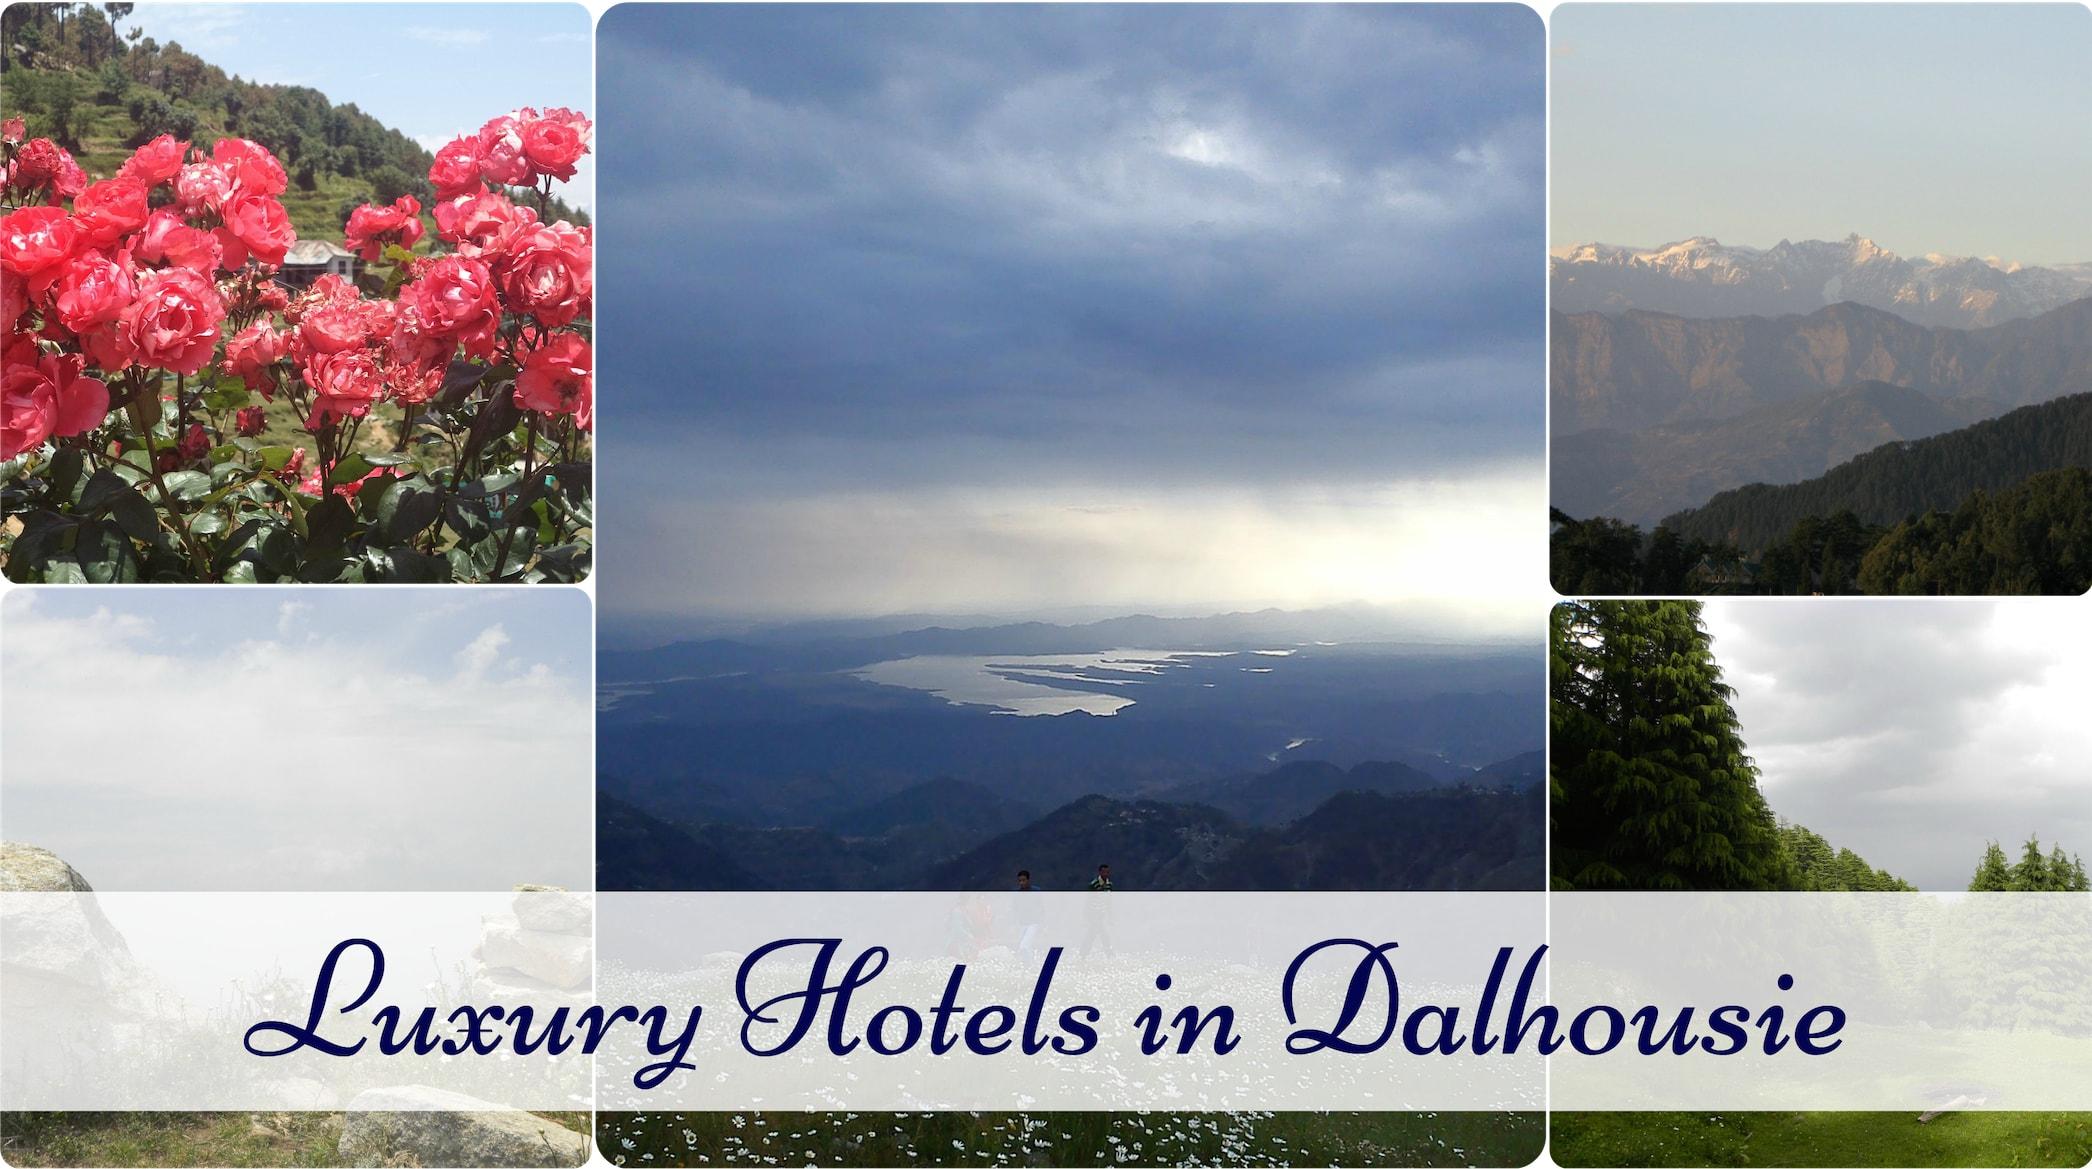 Hotels Dalhousie.jpg